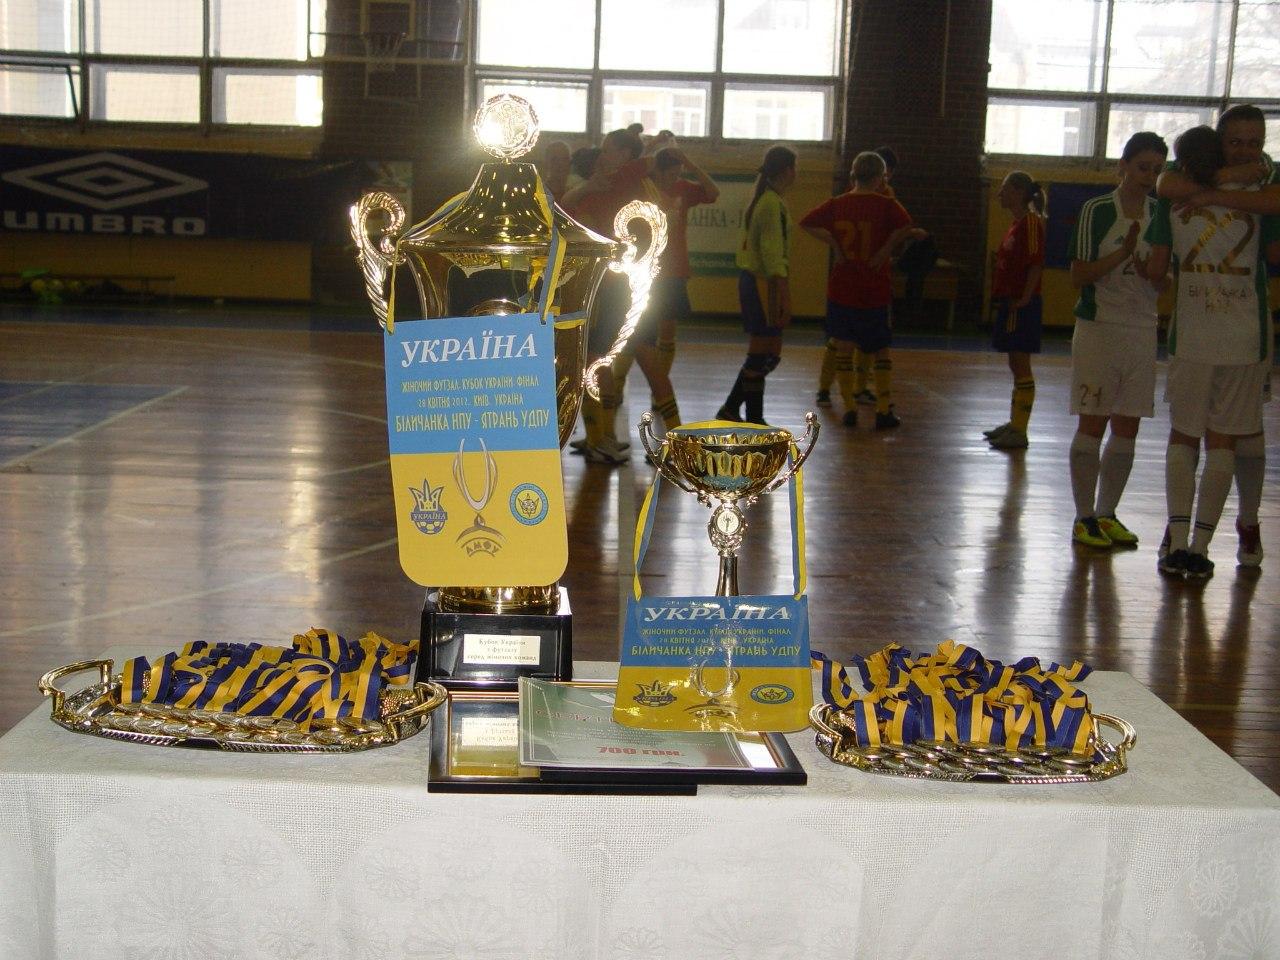 Кубок Украины 2011/2012: итоги «Беличанка НПУ»